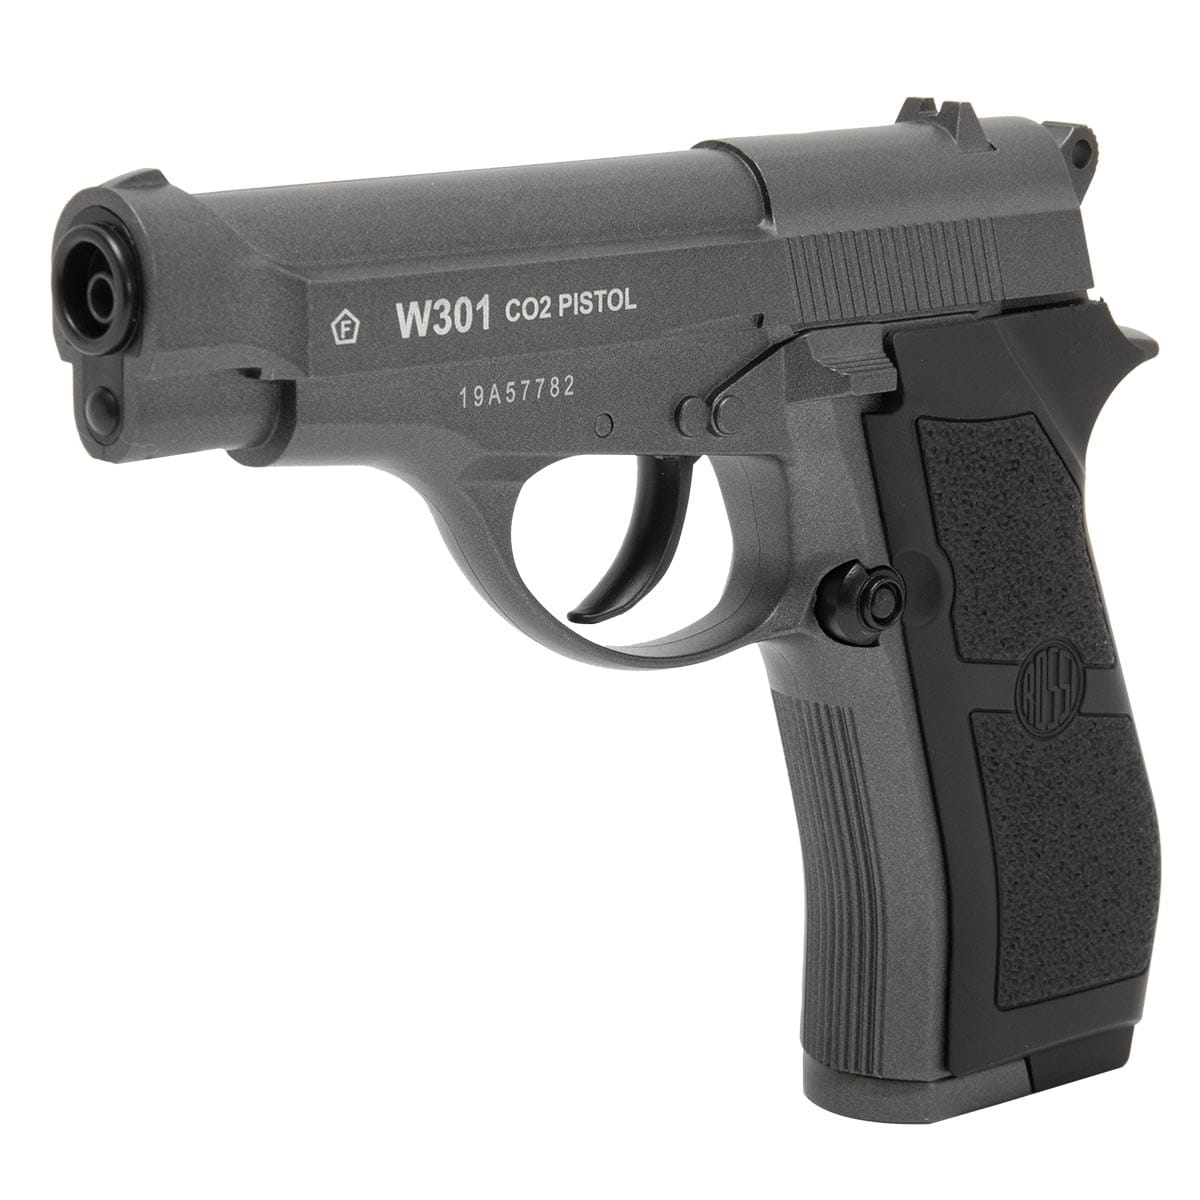 Pistola W301 CO2 Wingun 4,5mm Full Metal + kit